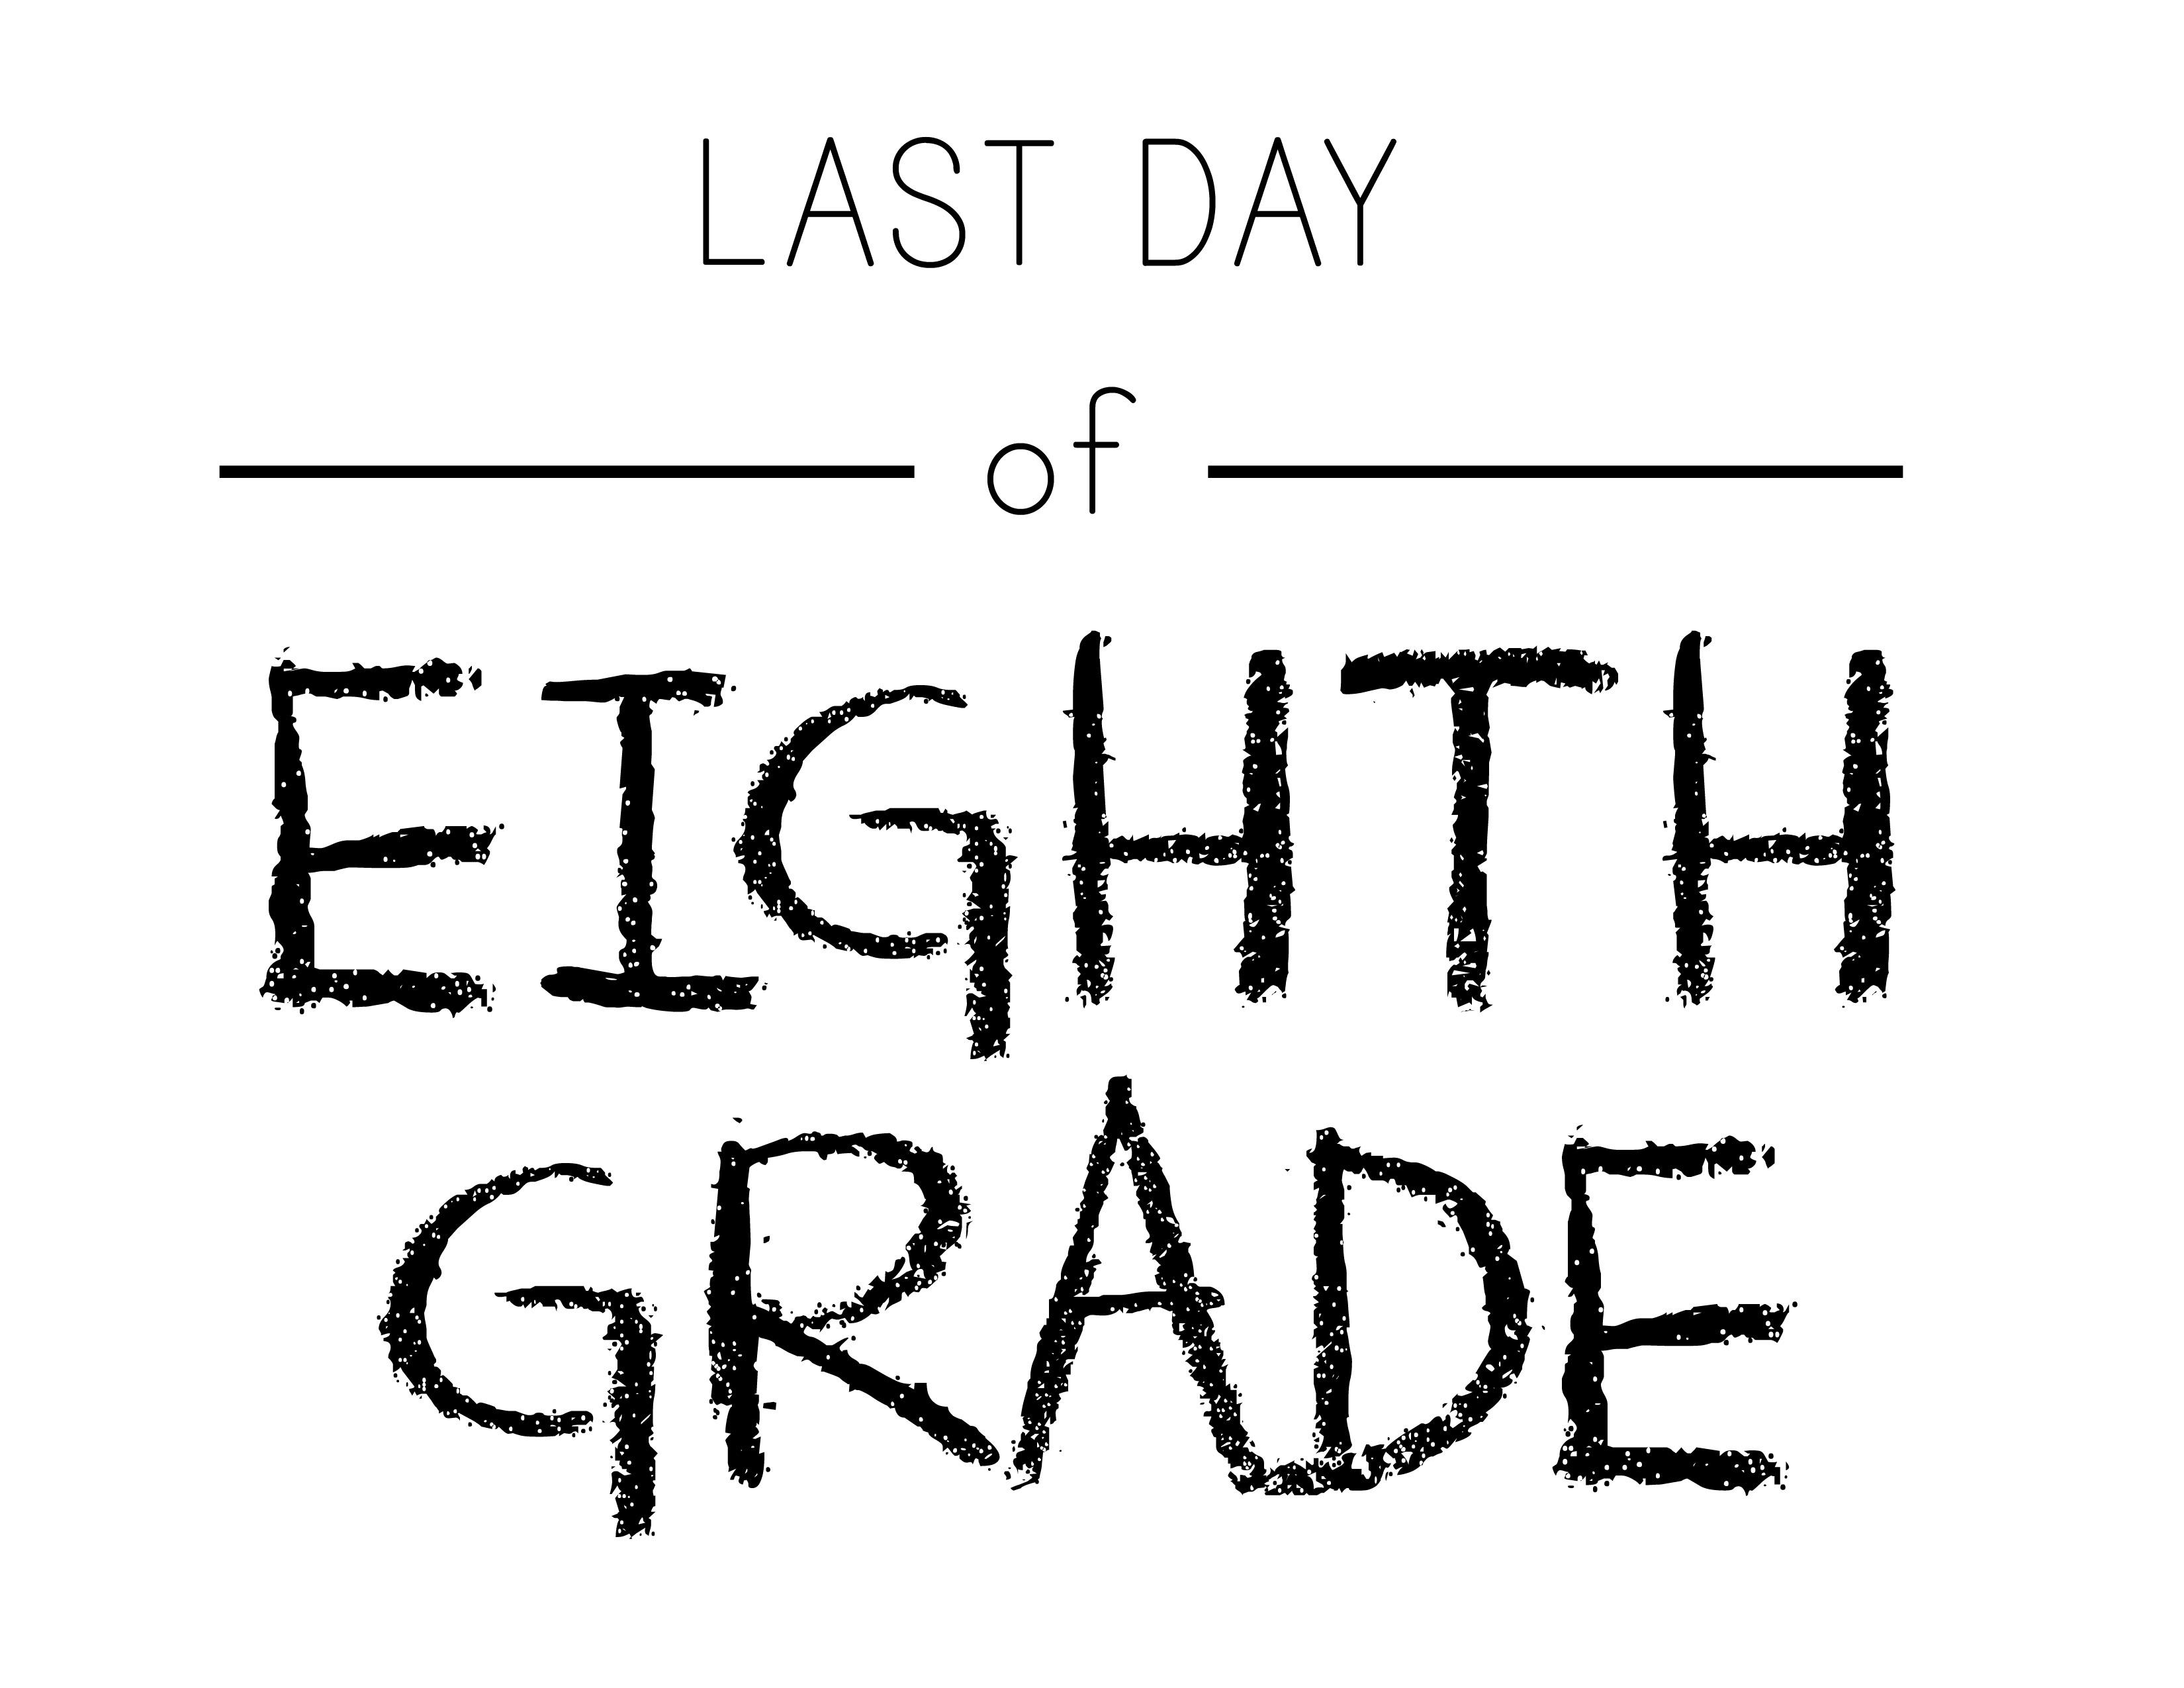 Free 8th Grade Cliparts, Download Free Clip Art, Free Clip Art on.